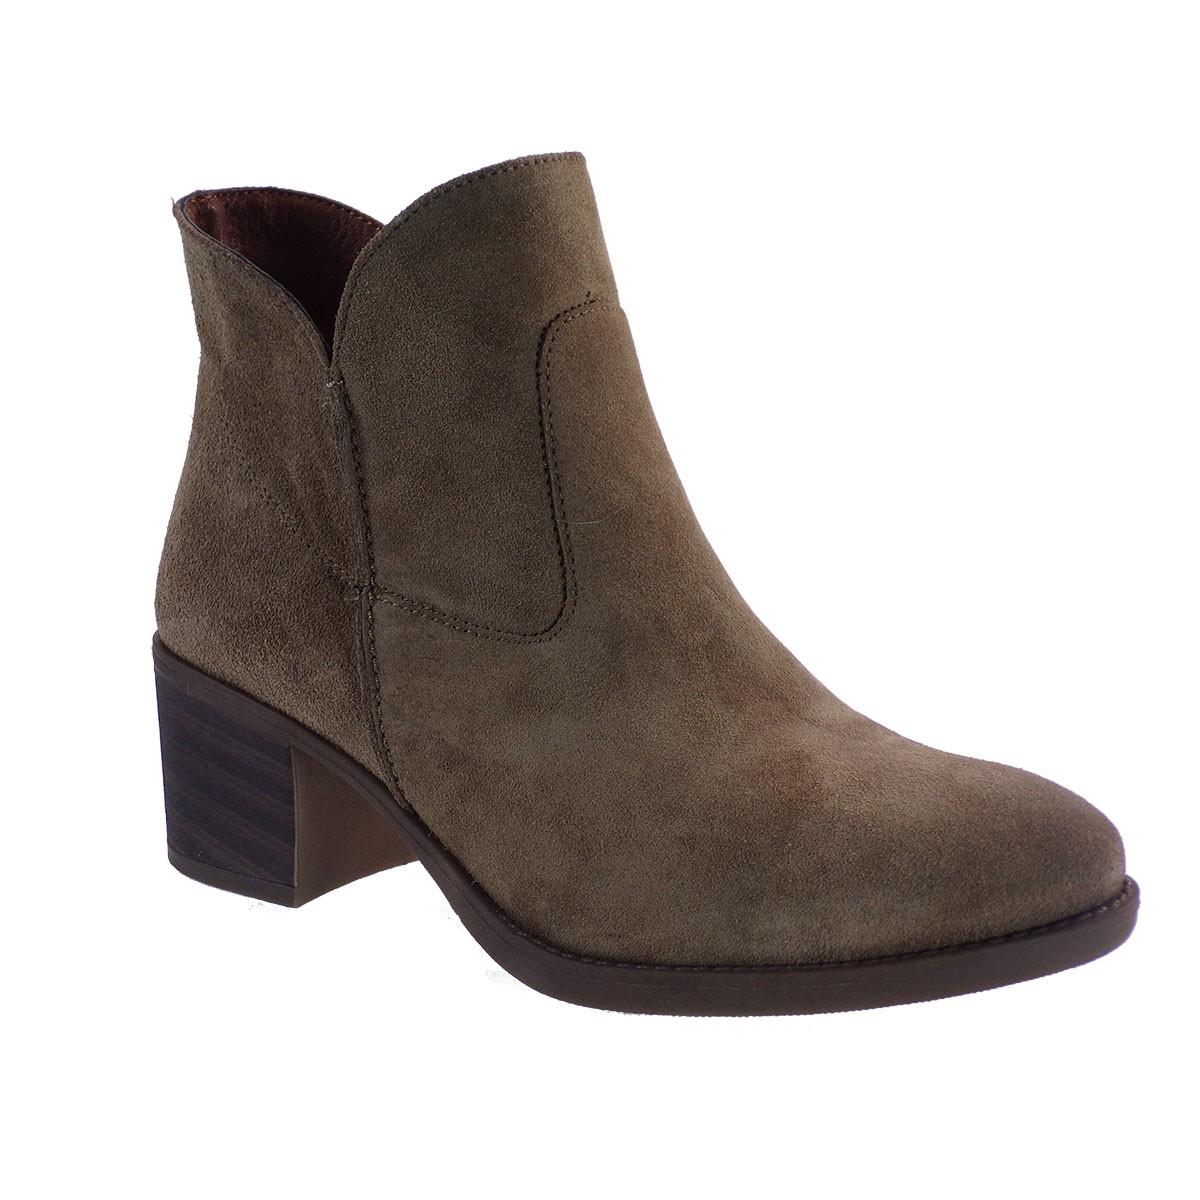 Commanchero Γυναικεία Παπούτσια Μποτάκια 5564-4213 Λαδί Καστόρι Δέρμα